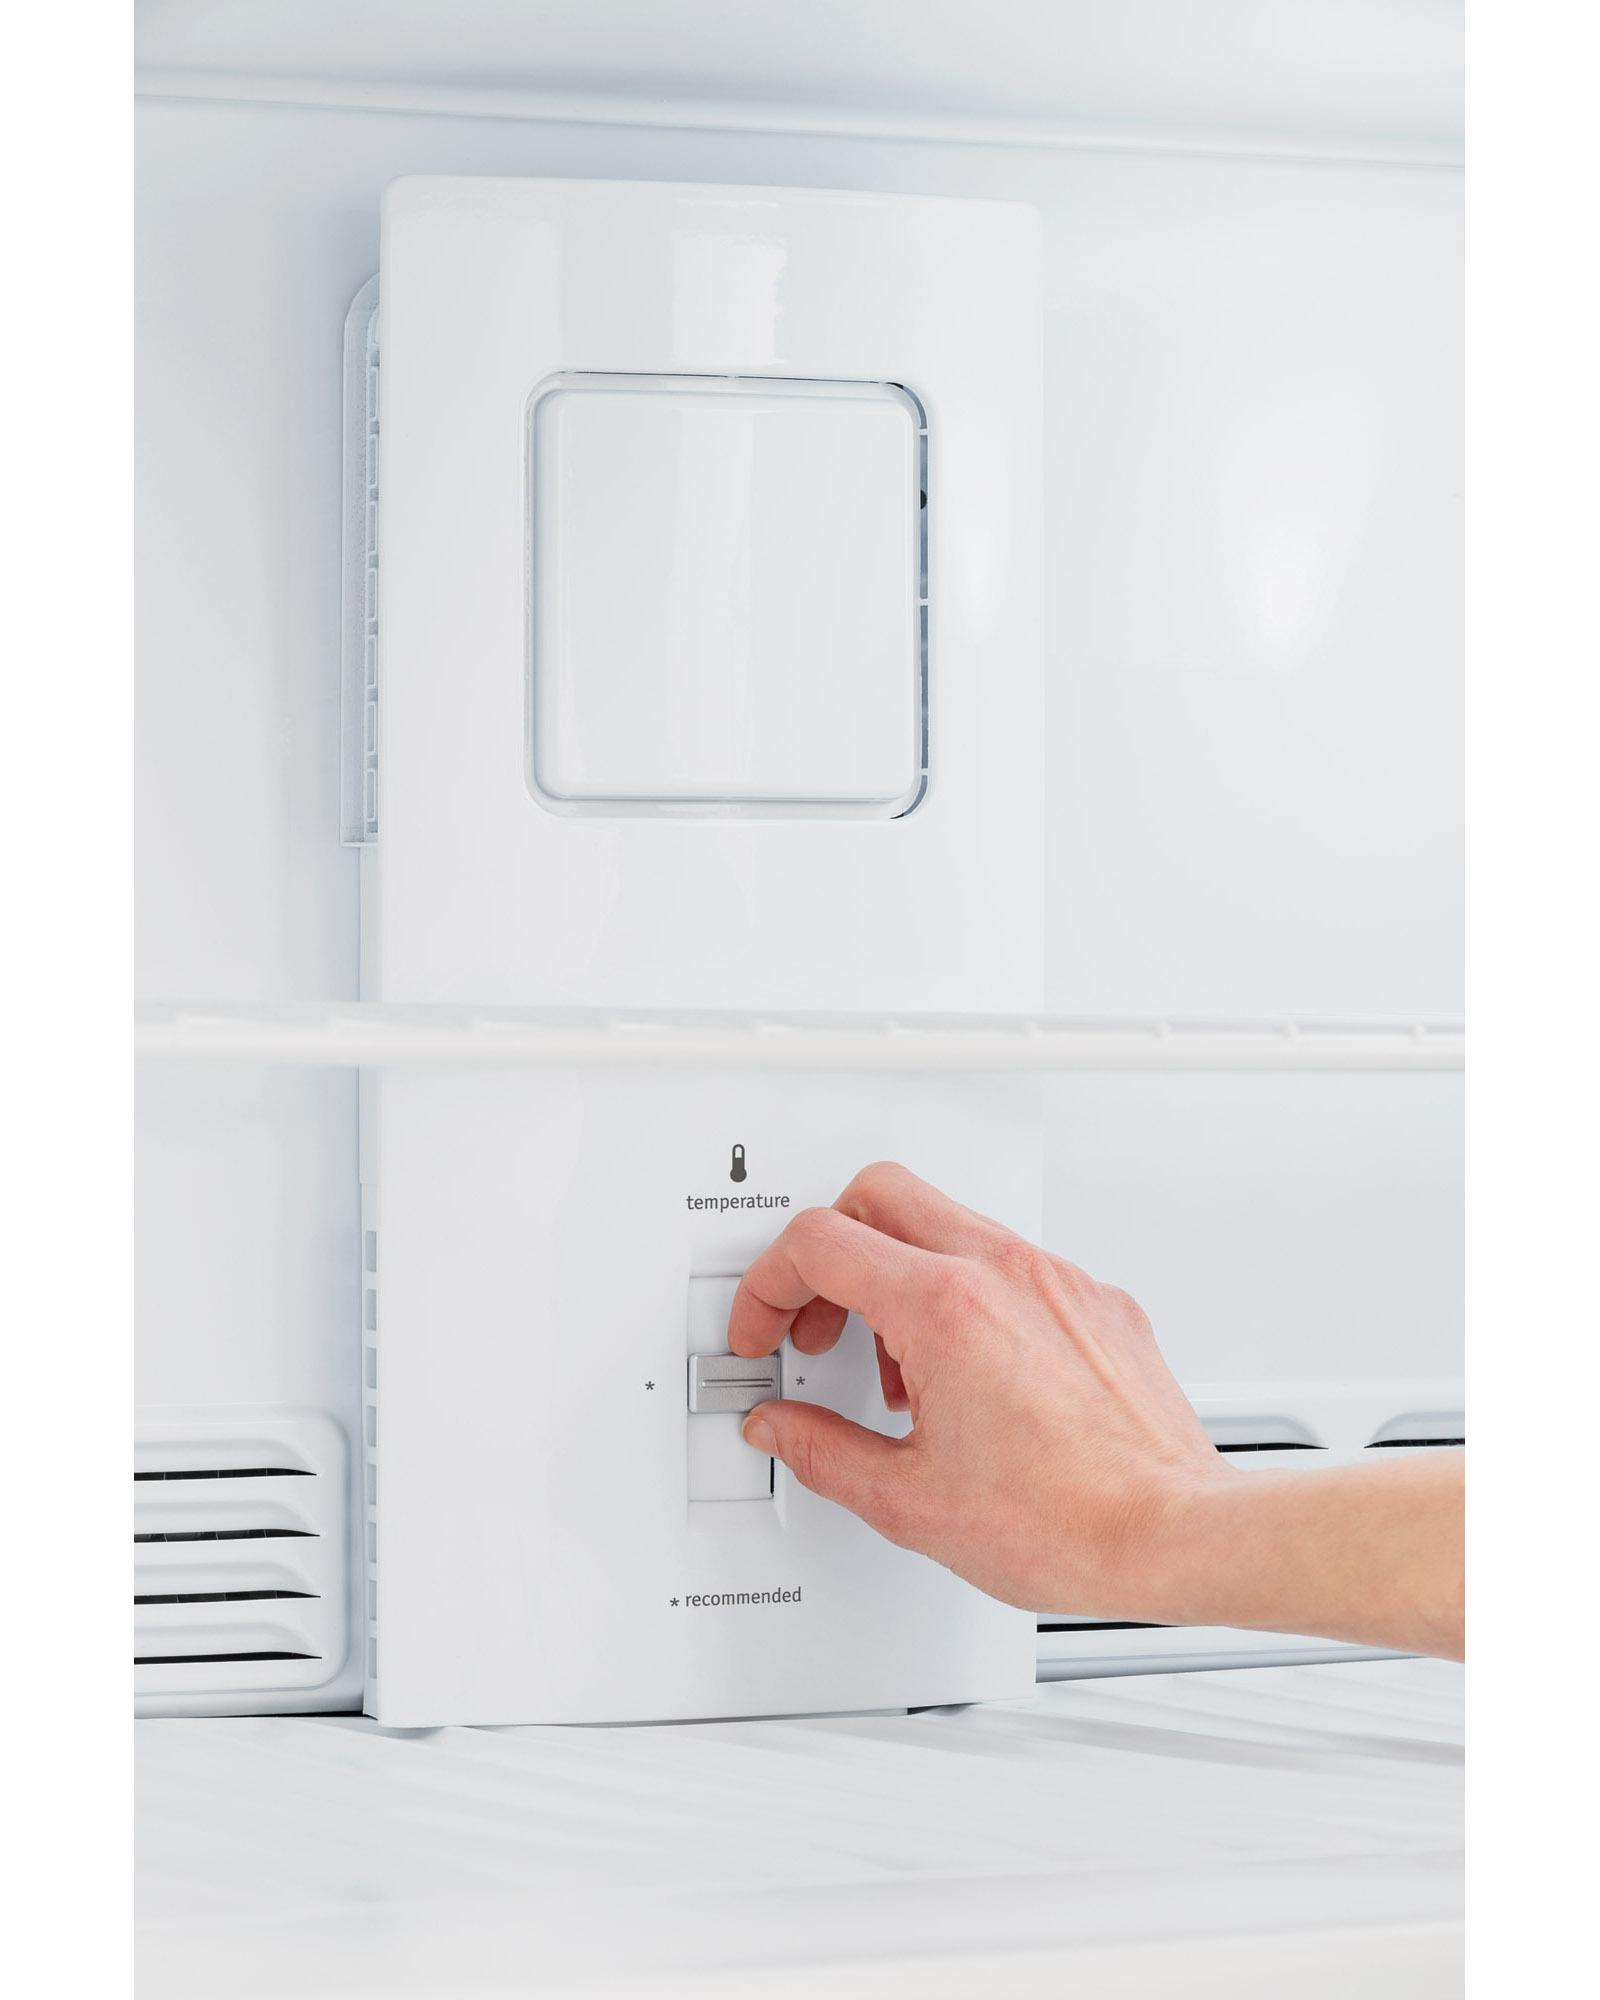 Frigidaire 16.3 cu. ft. Top-Mount Refrigerator - White